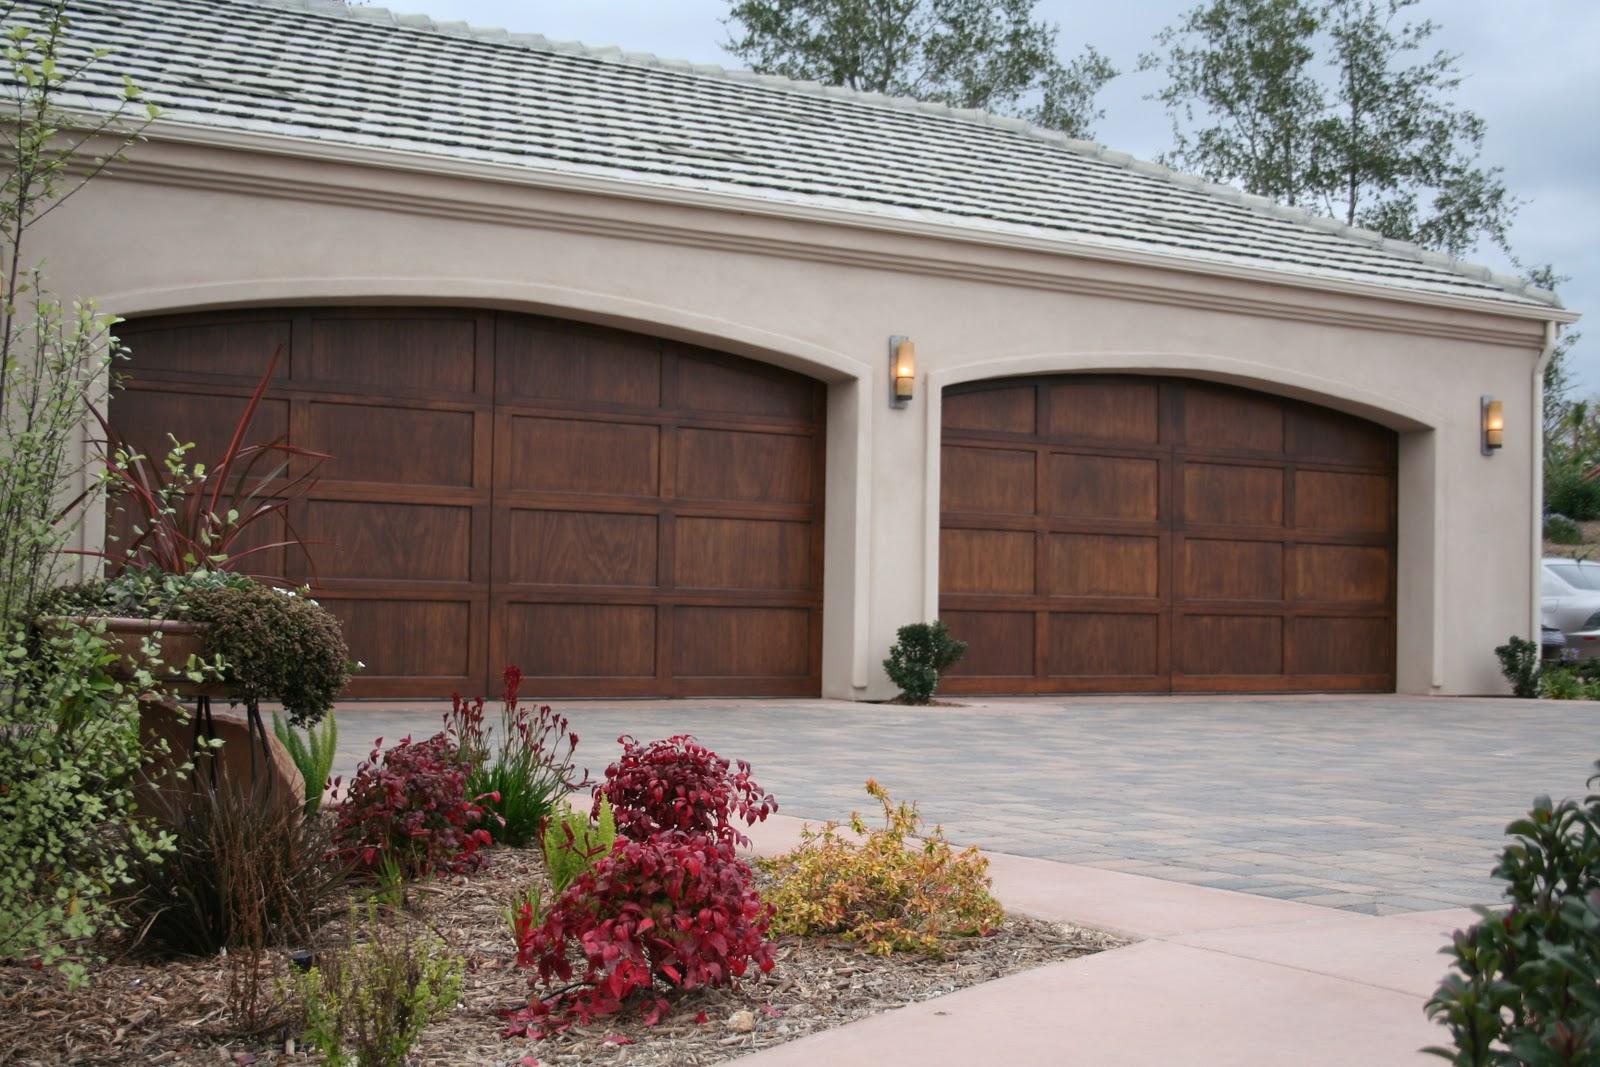 Home Garage Design: 4-Car Garages